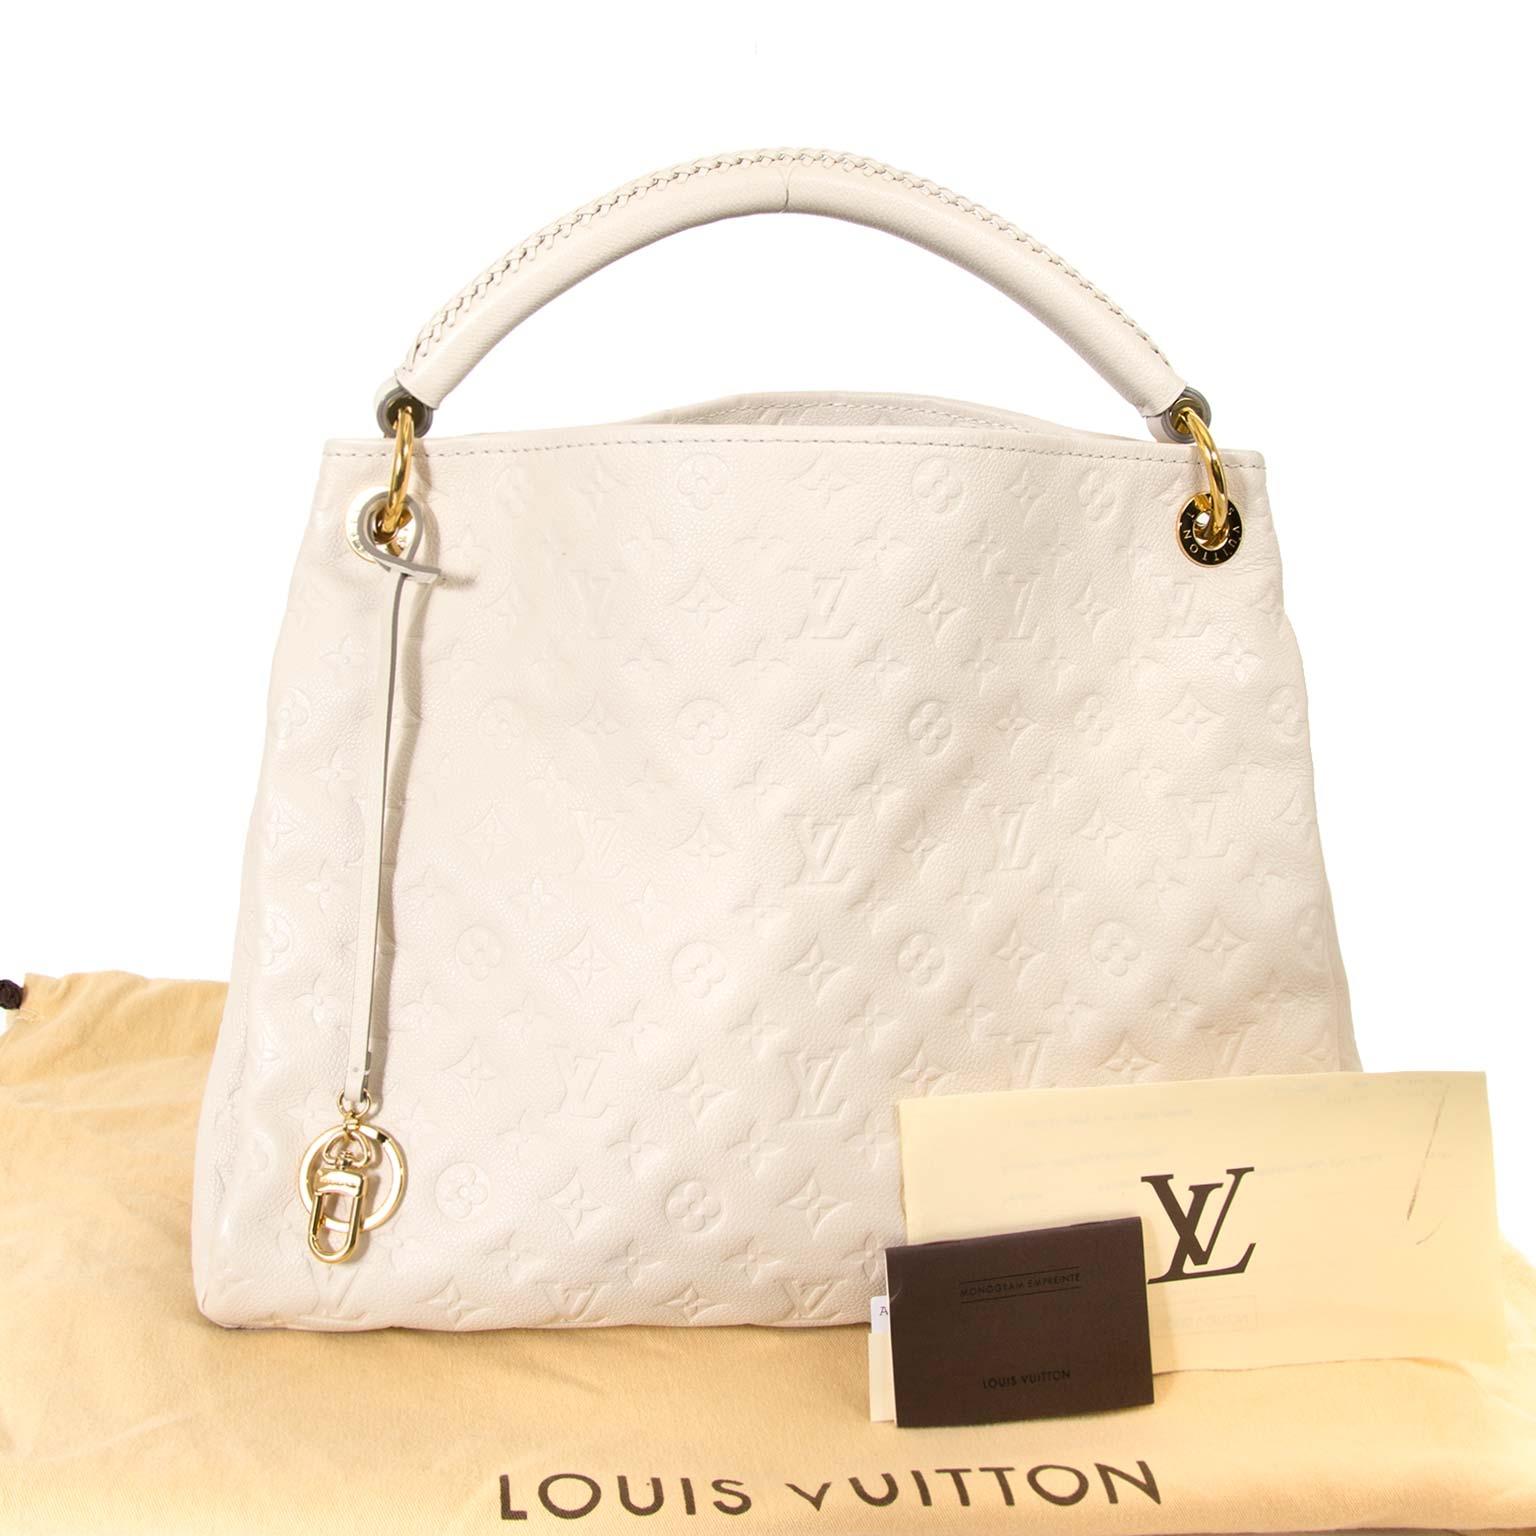 47f3a0547909 ... louis vuitton white cream artsy mm bag now for sale at labellov vintage  fashion webshop belgium